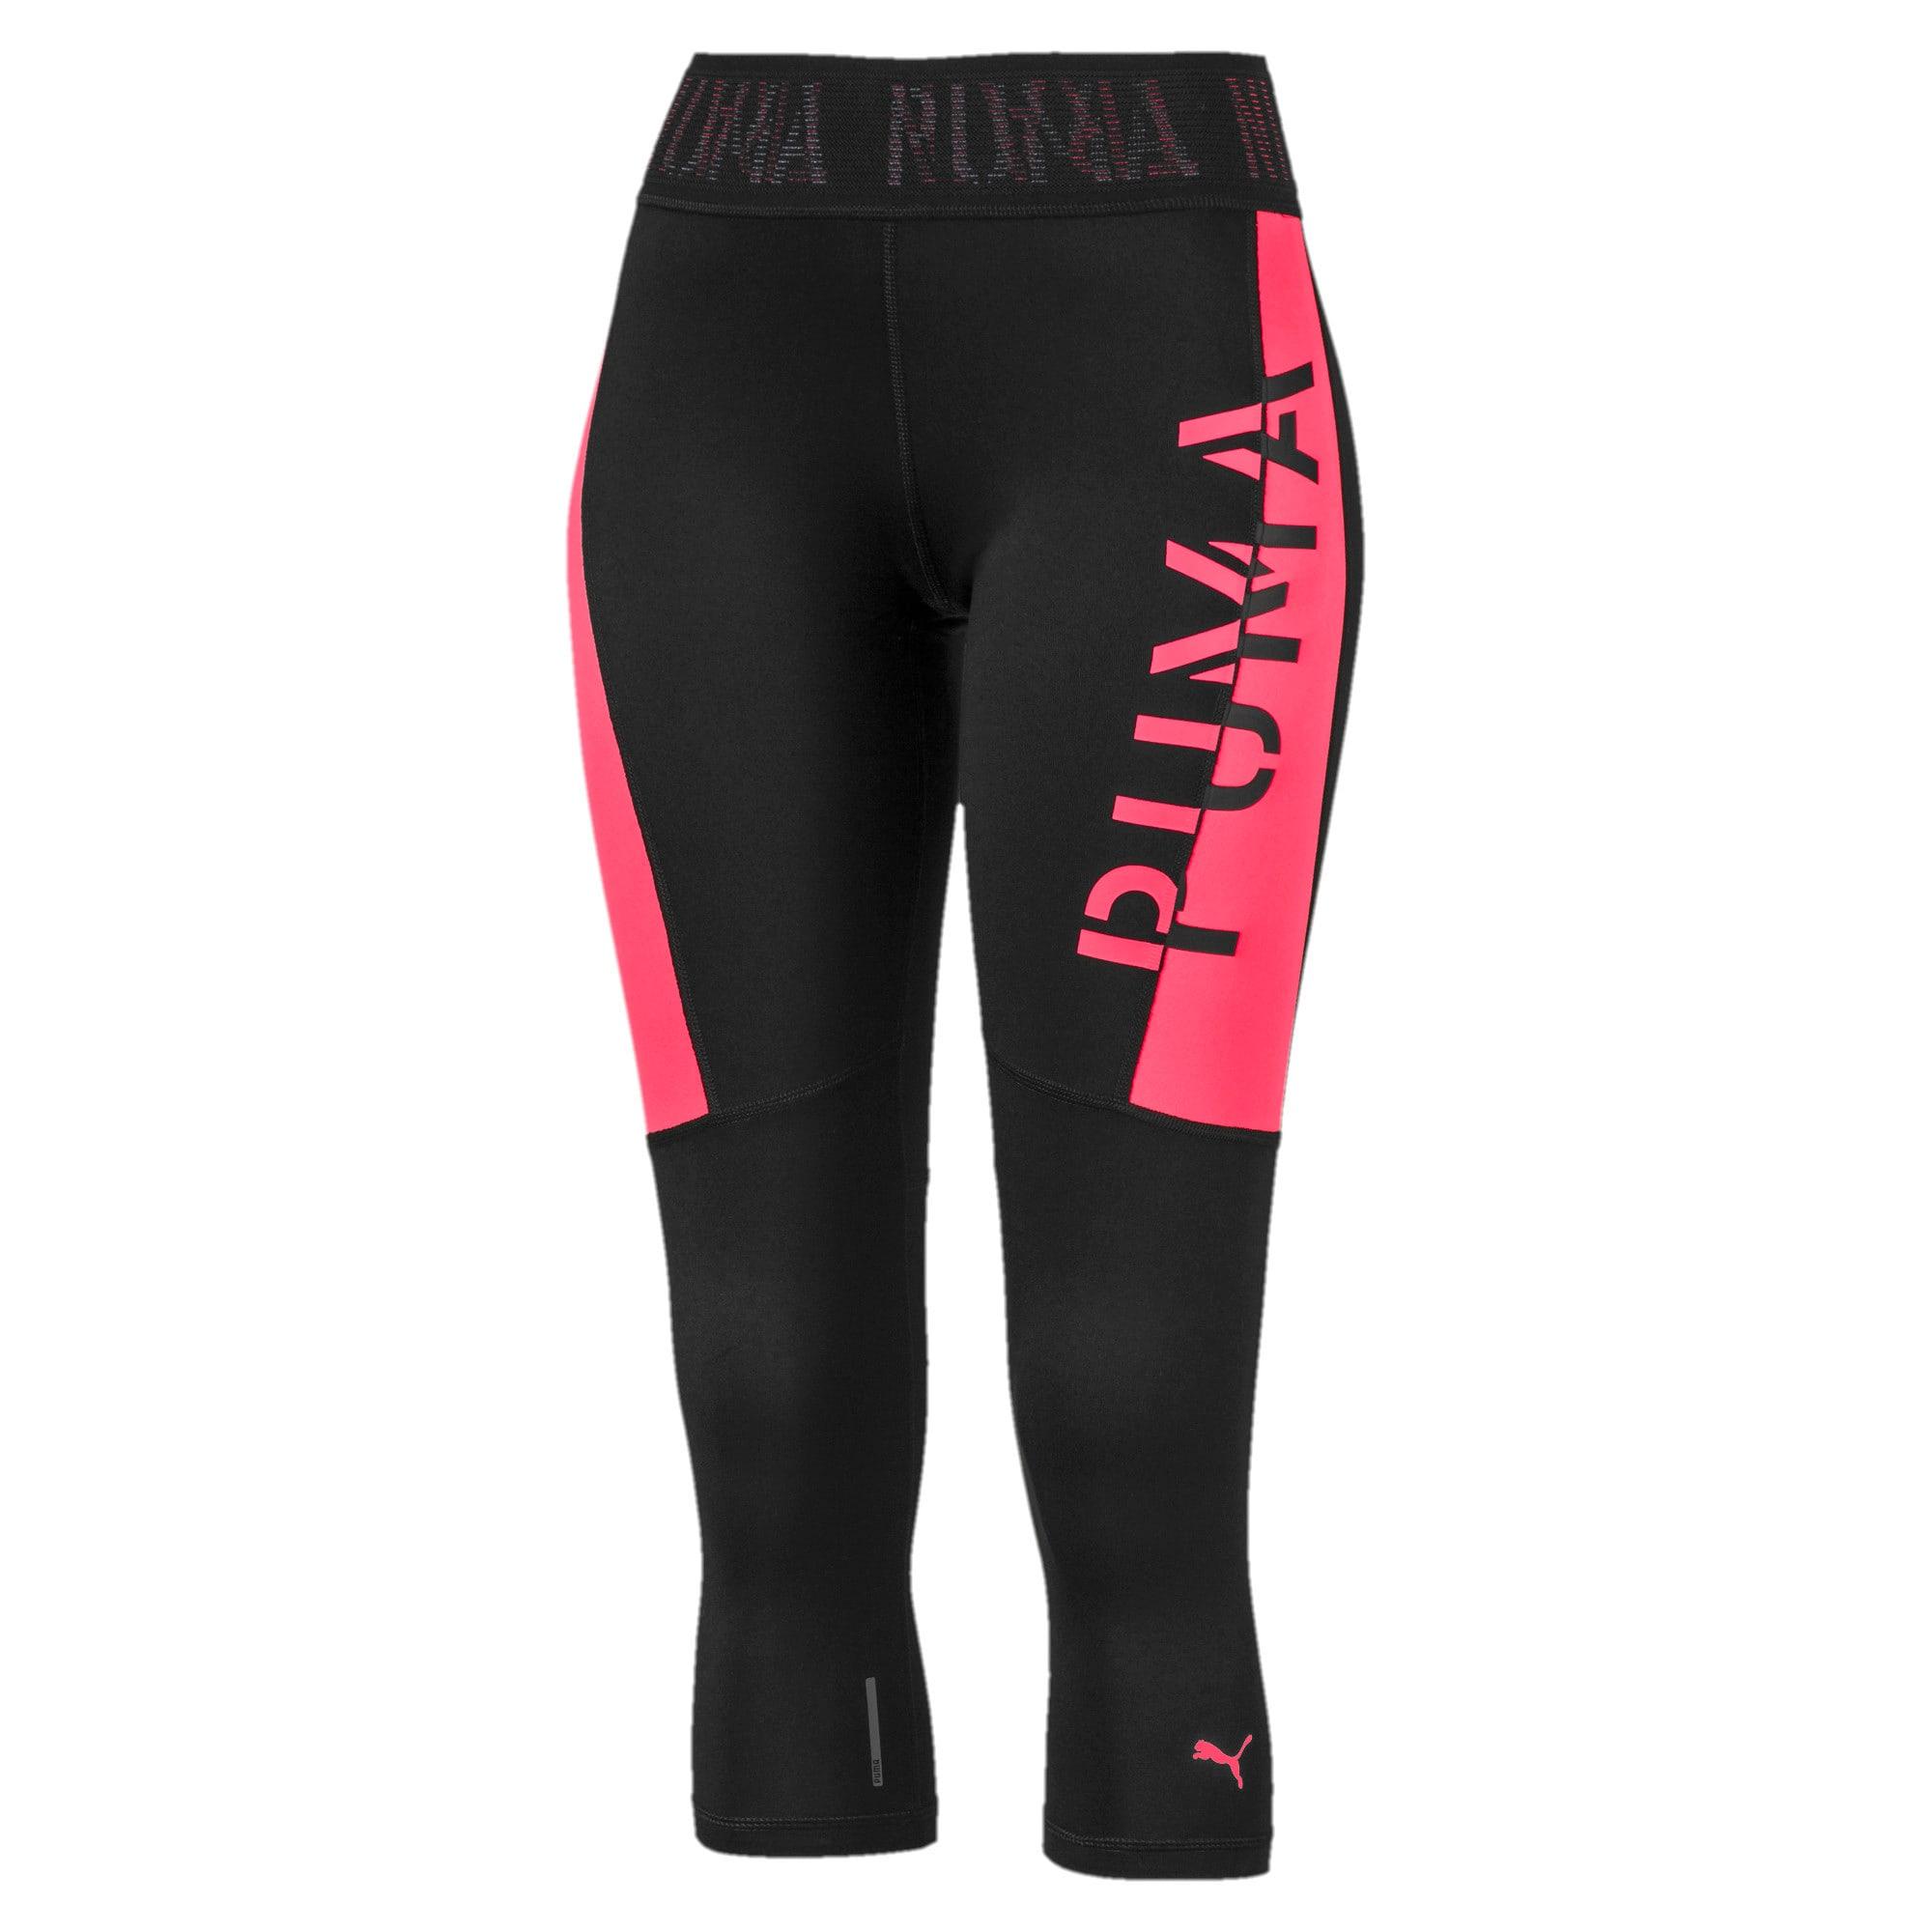 Thumbnail 4 of Logo 3/4 Women's Training Tights, Puma Black-Pink Alert, medium-IND